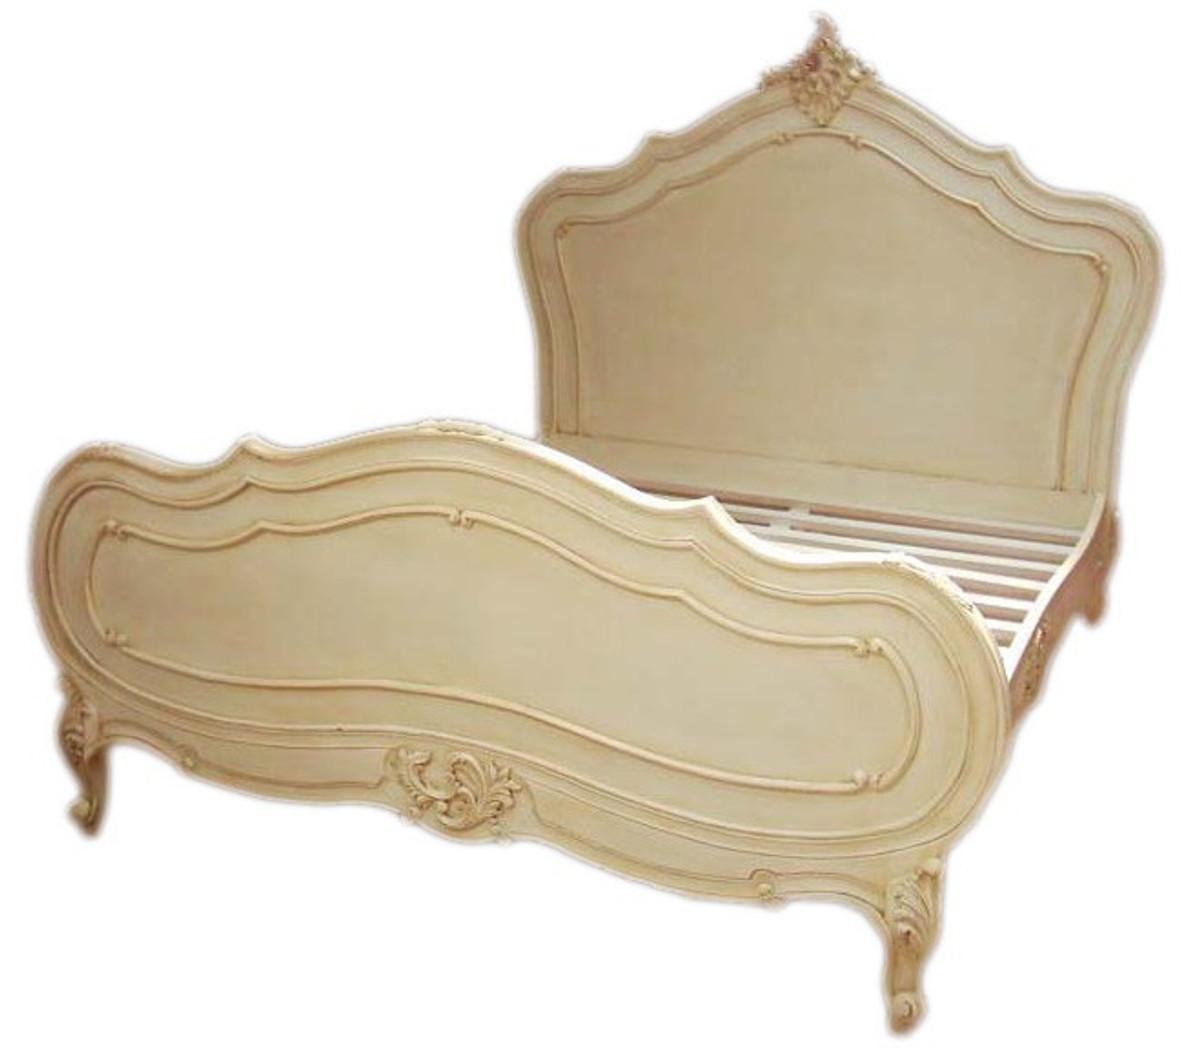 barock bett maison paris antik creme 180 x 200 cm aus der luxus kollektion von casa padrino casa. Black Bedroom Furniture Sets. Home Design Ideas